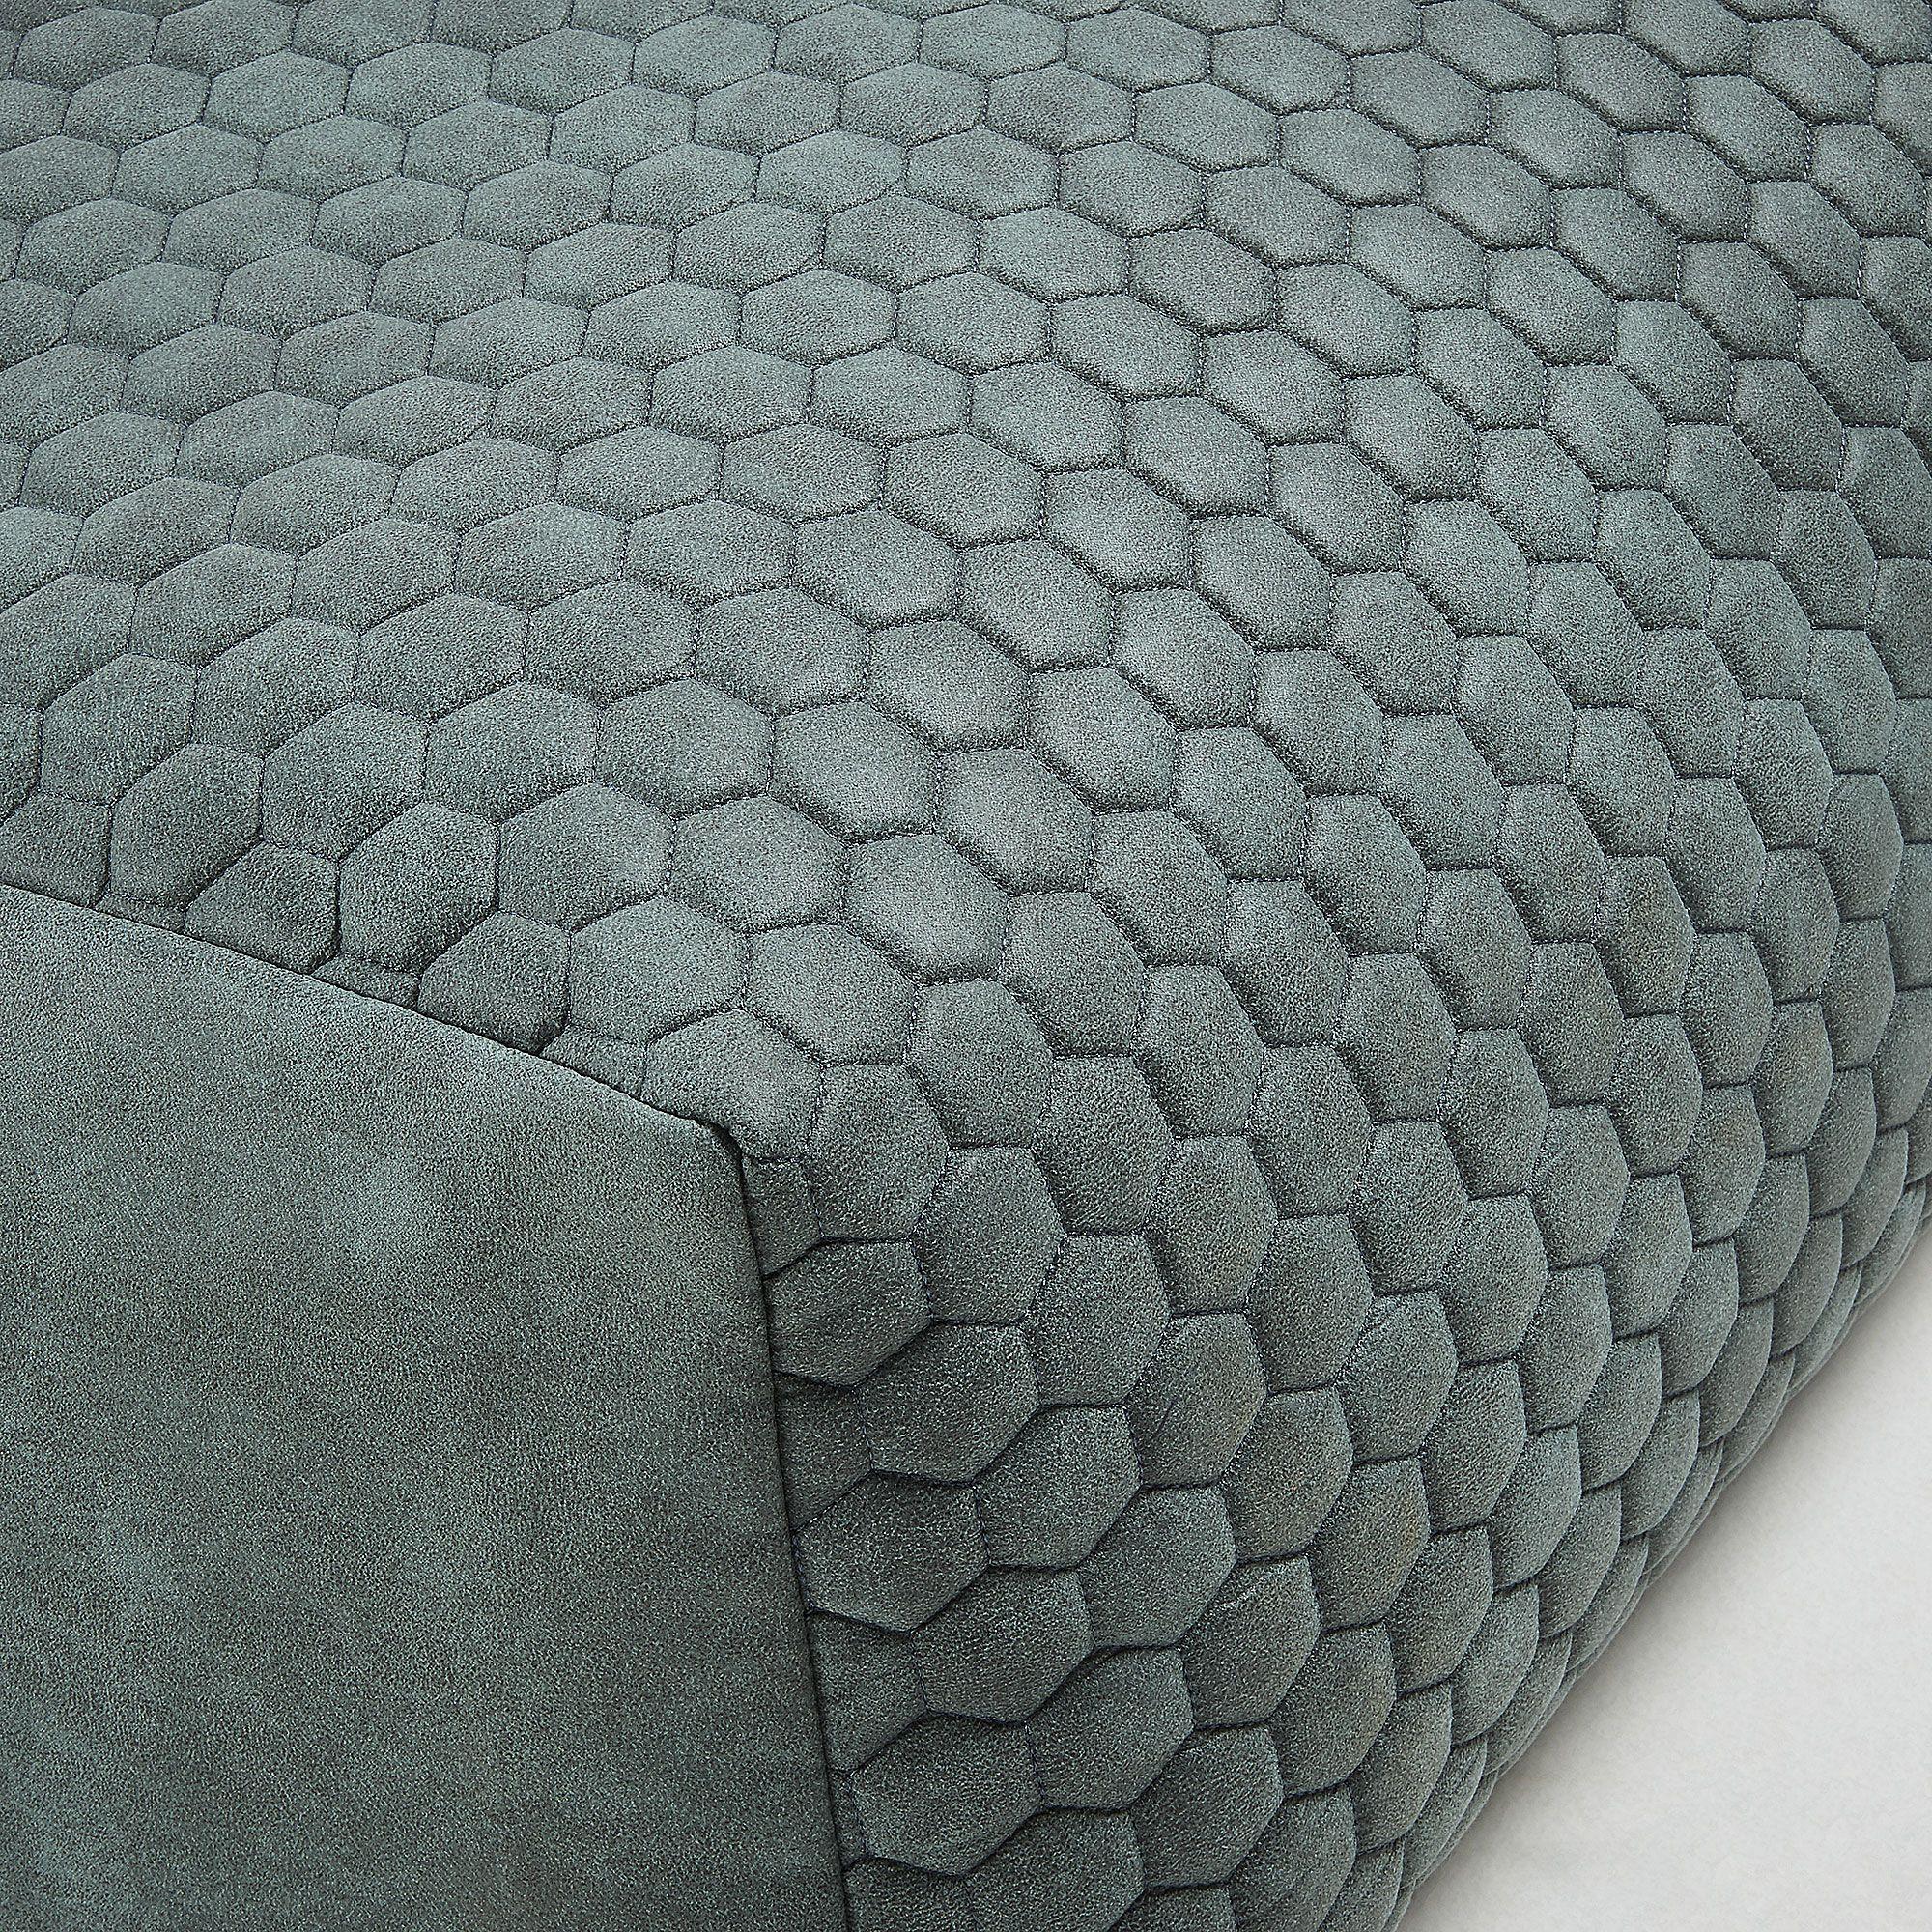 LaForma Damian Puf 60x60 - Grøn